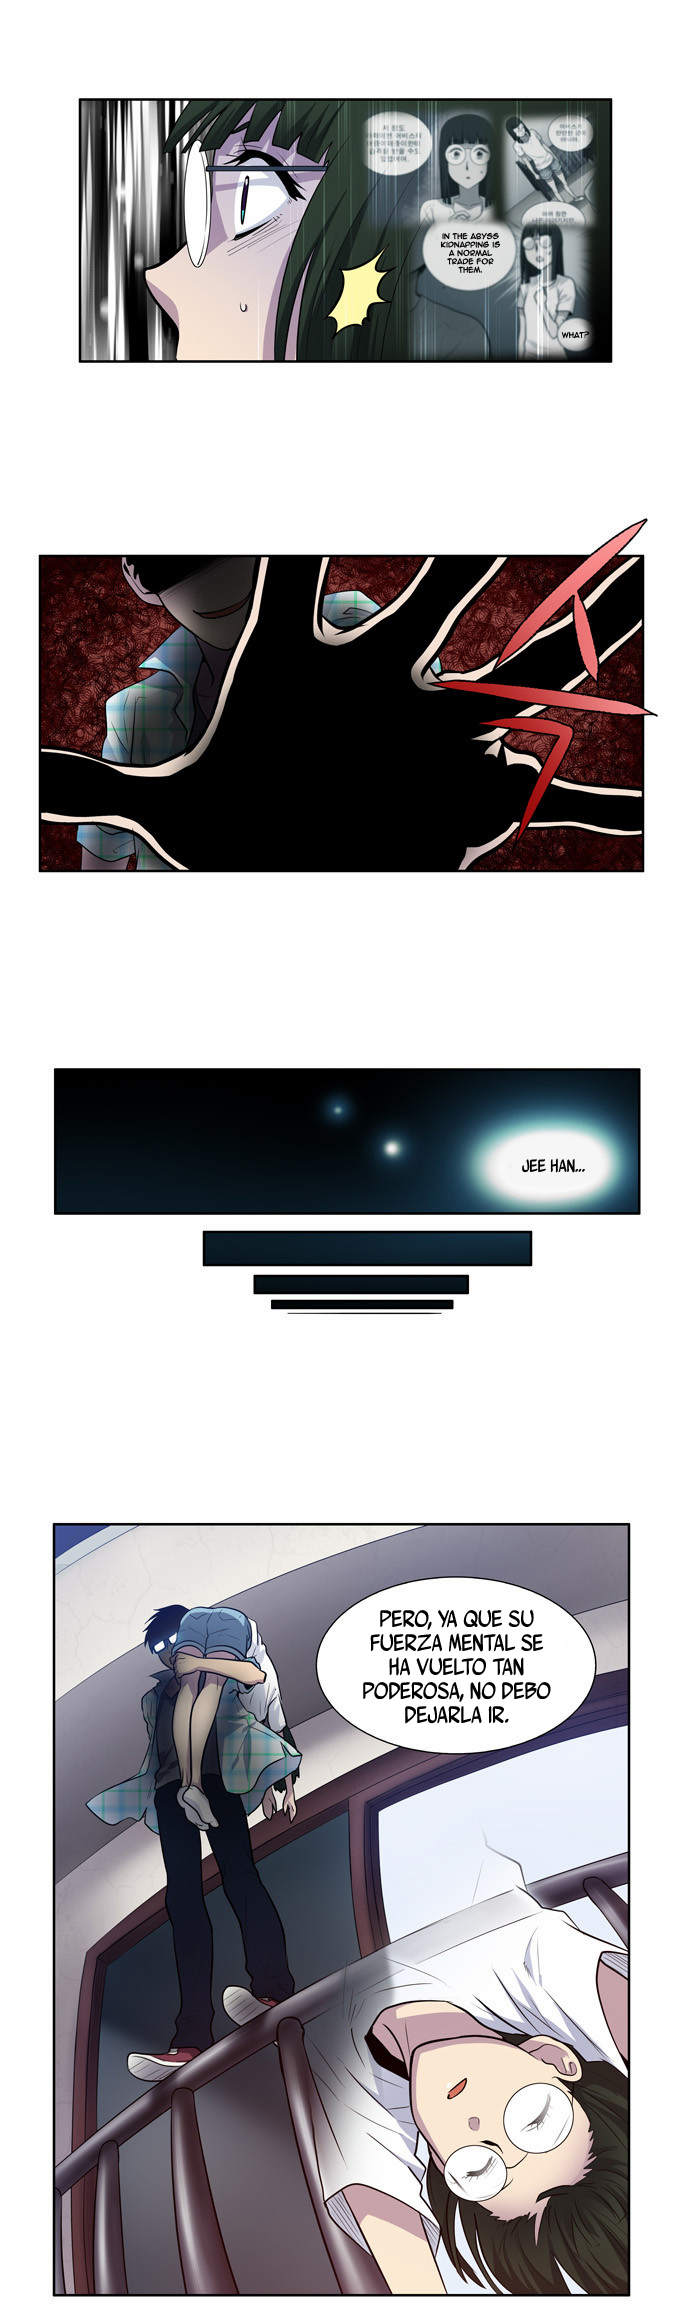 https://c5.ninemanga.com/es_manga/61/1725/439976/1957a61f2ef900e93835e8f9f7aeab18.jpg Page 18